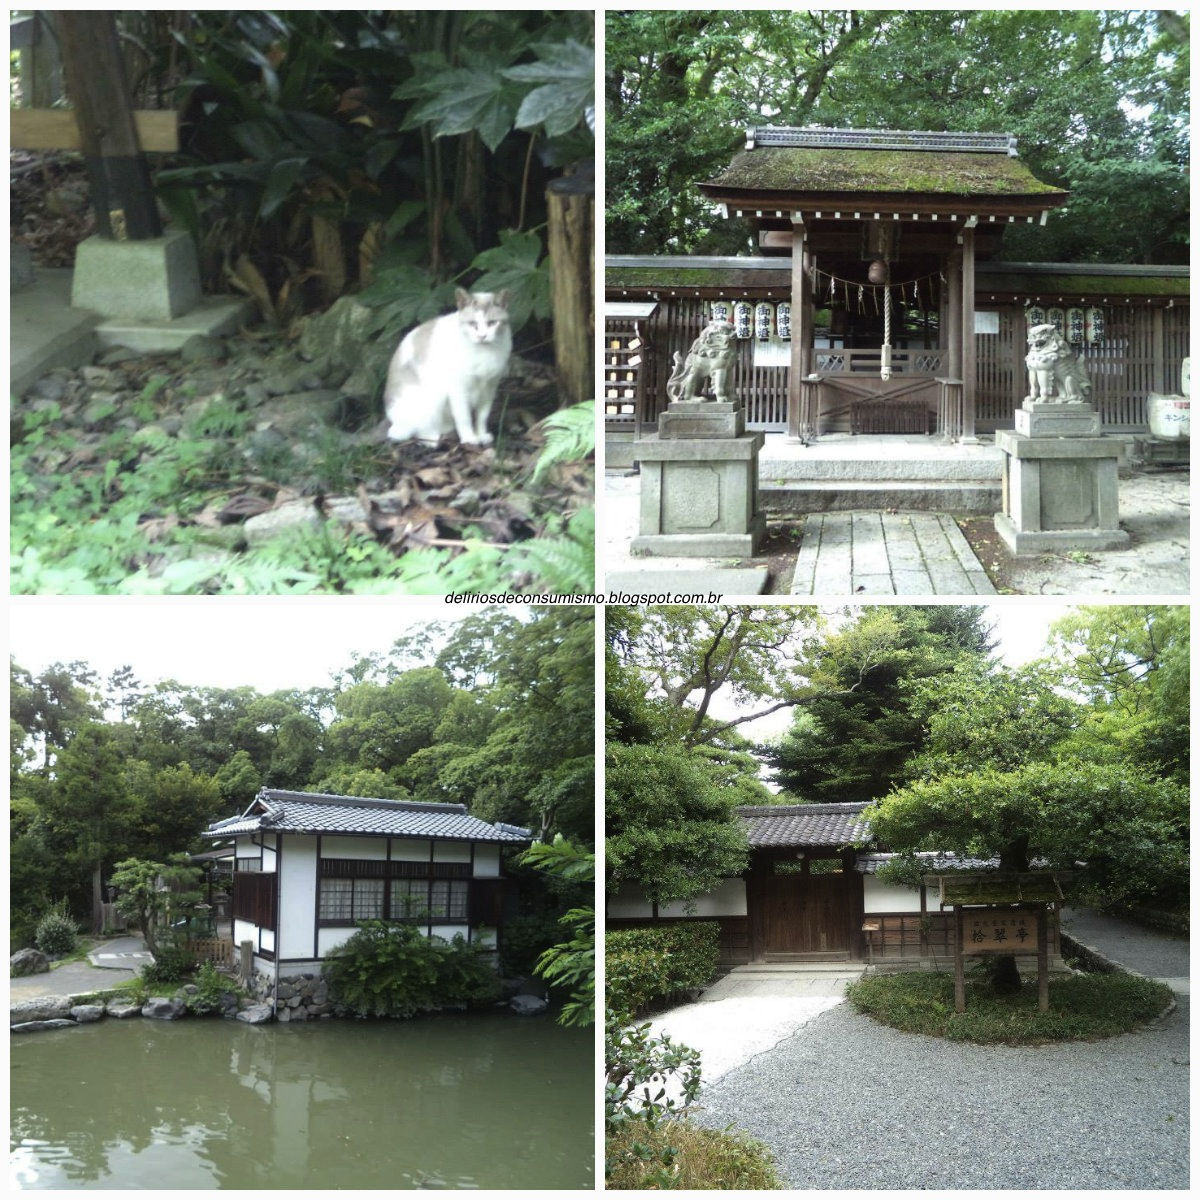 Kyoto, Quioto, Japão, Japão, trip, travel, templo, gato, Castelo, Castle, Nijo, Nijo Castle